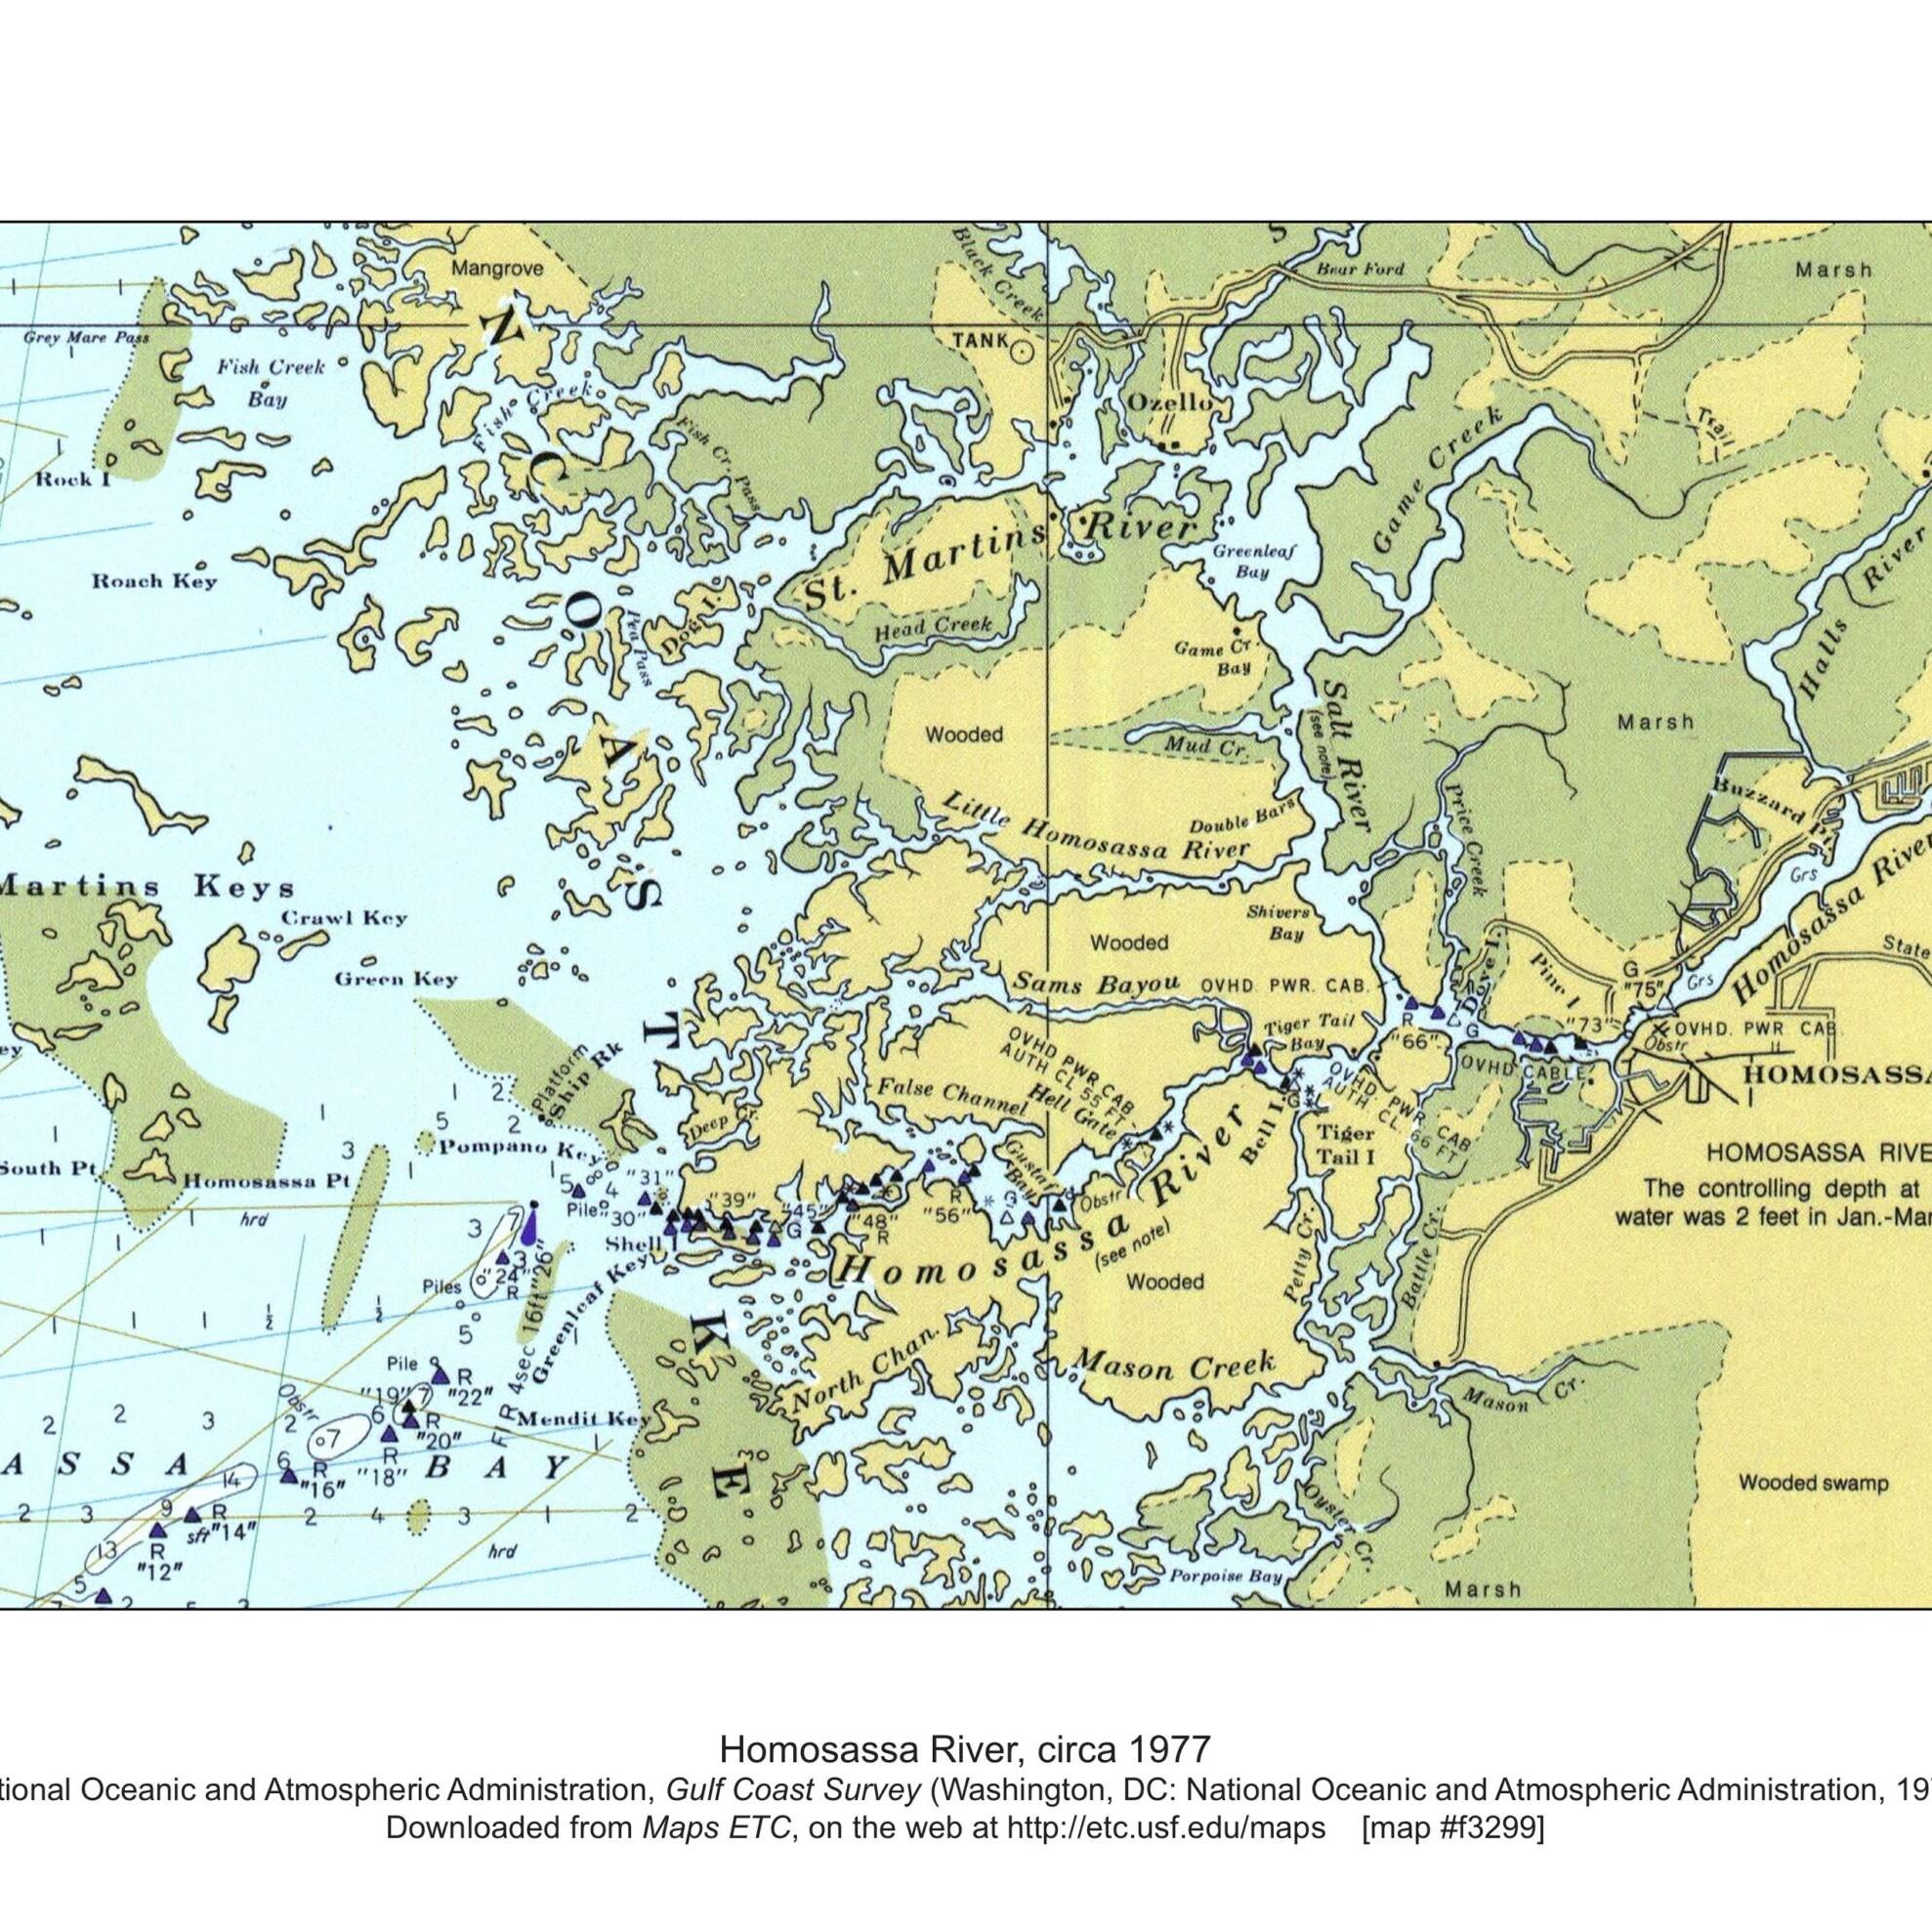 Homosassa River Map NOAA 1977